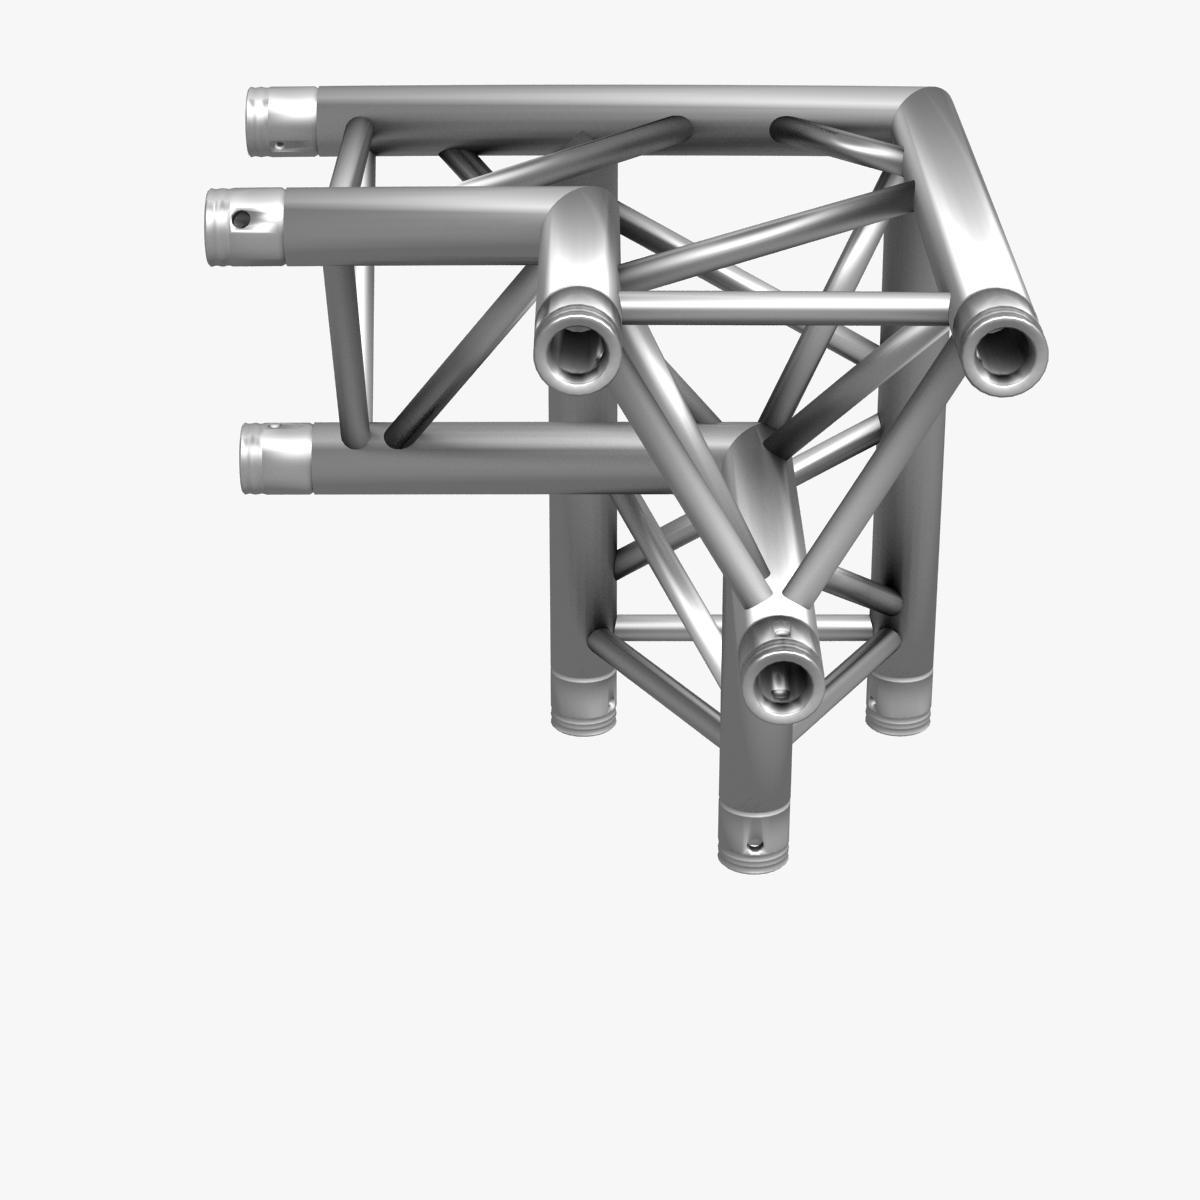 triangular trusses (collection 55 modular pieces) 3d model 3ds max dxf fbx c4d dae texture obj 216240